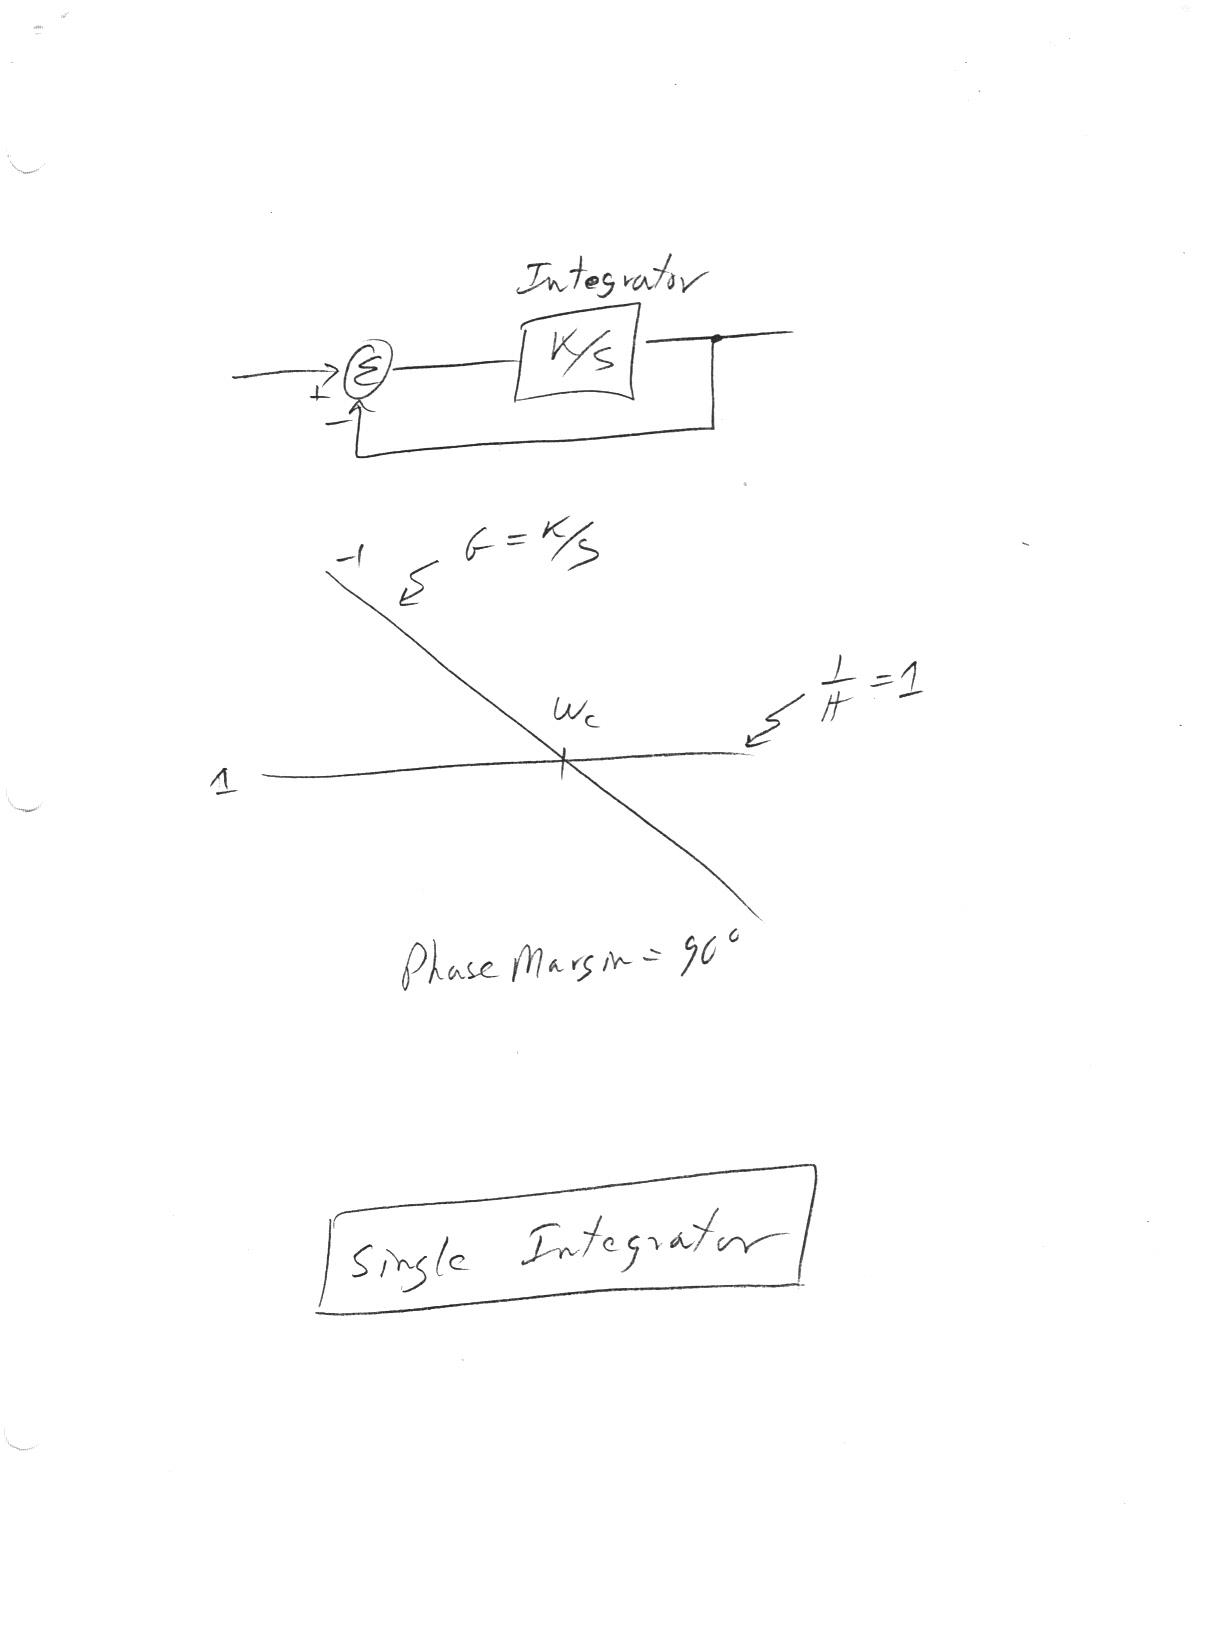 Twinkle toes engineering bode diagram detailed bode tutorial14 ccuart Gallery